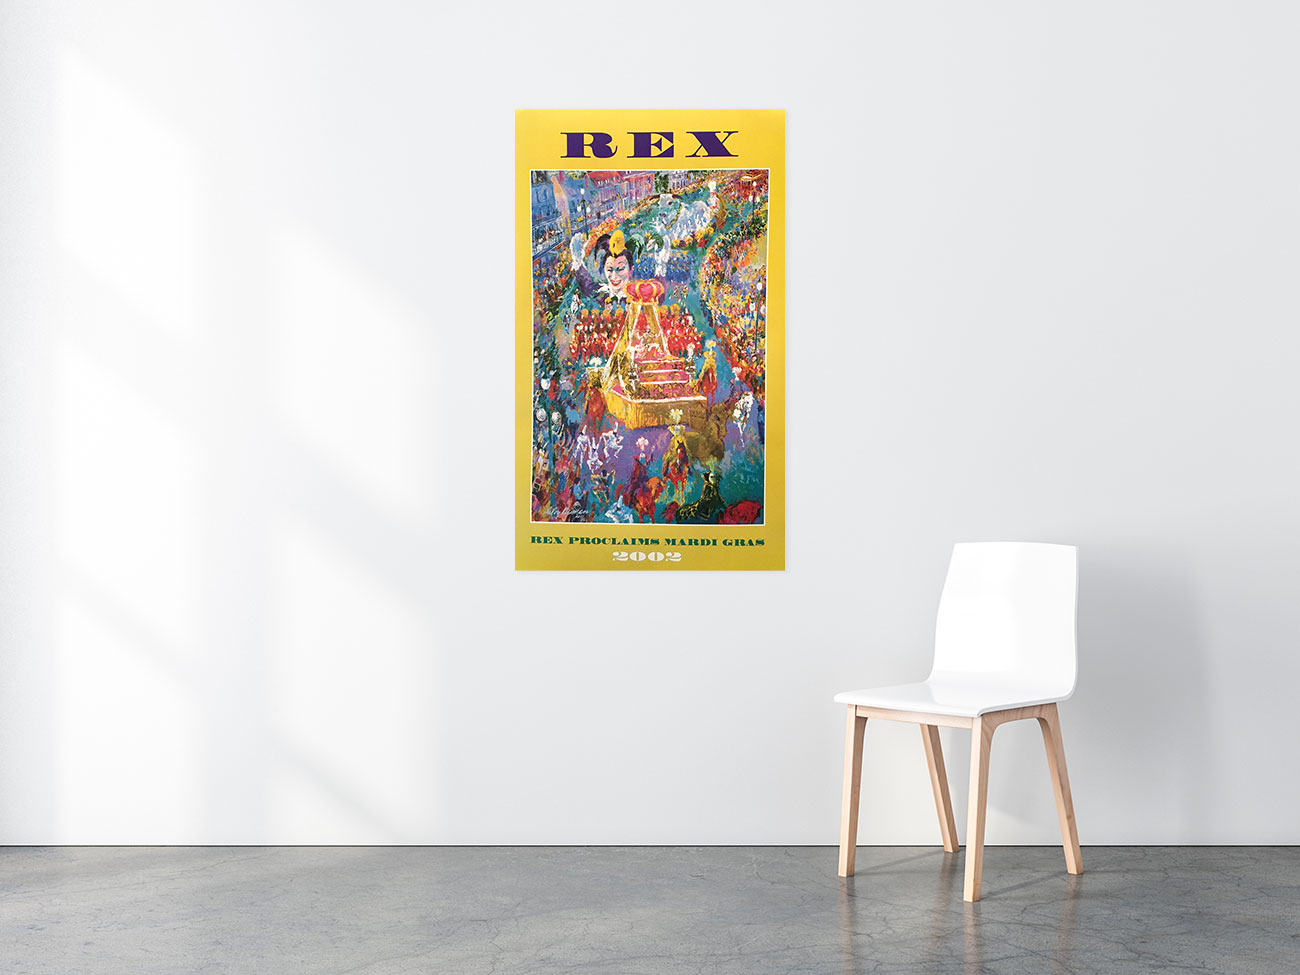 Rex Proclaims Mardi Gras poster in situ